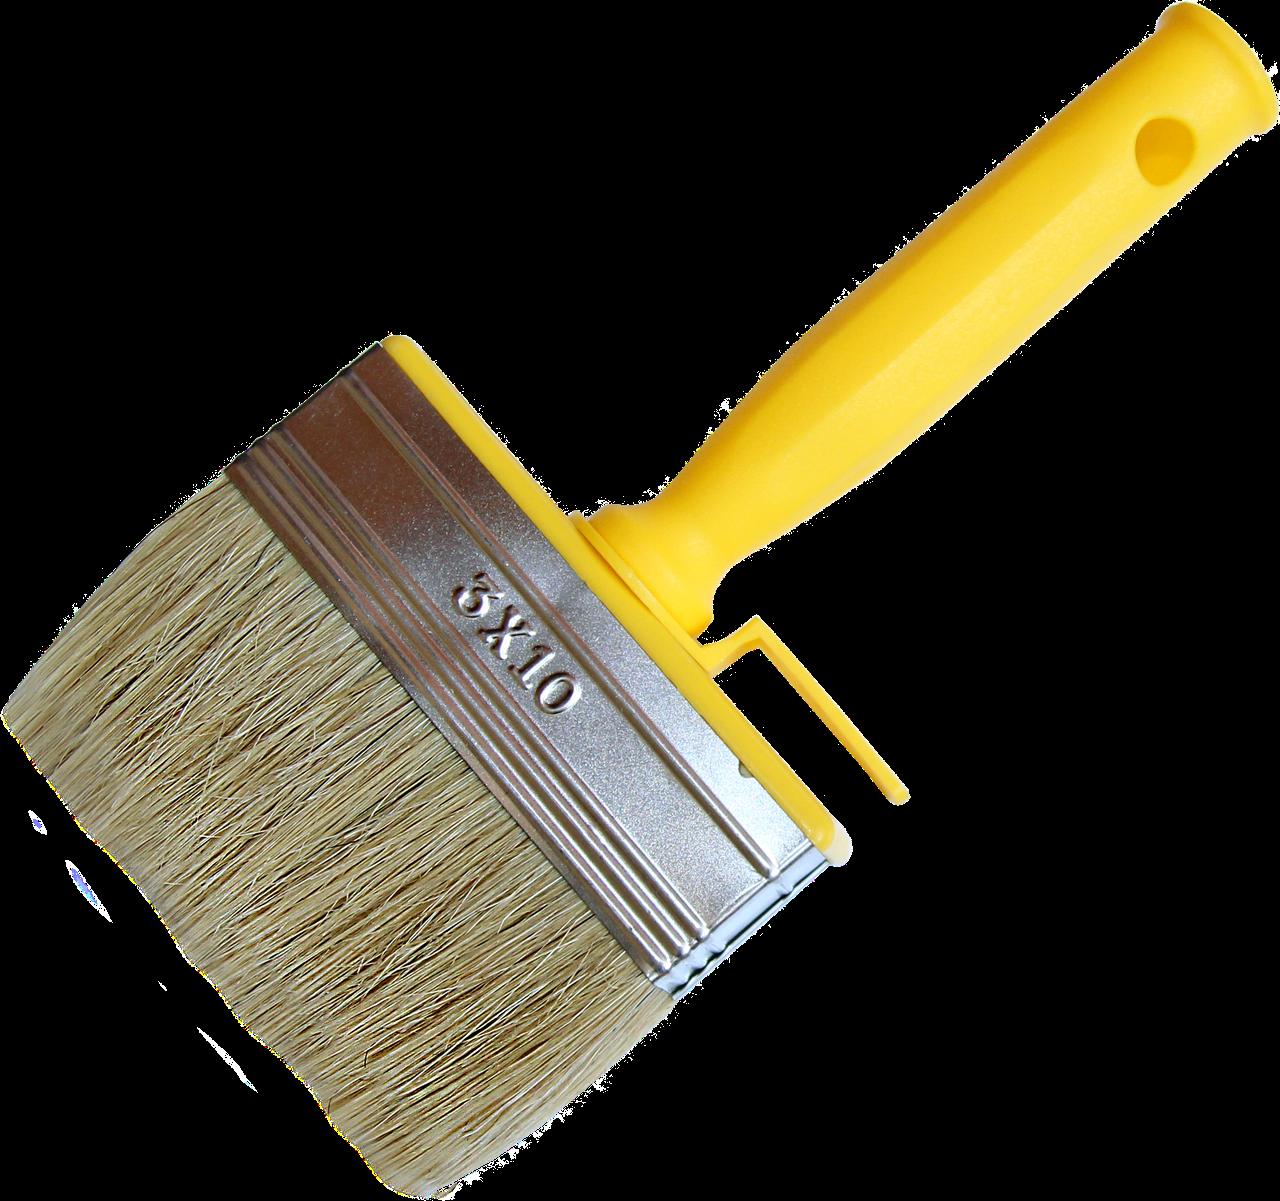 Кисть-макловица тип Мини 50 мм х 150 мм пластиковая ручка HTtools (кисти малярные)